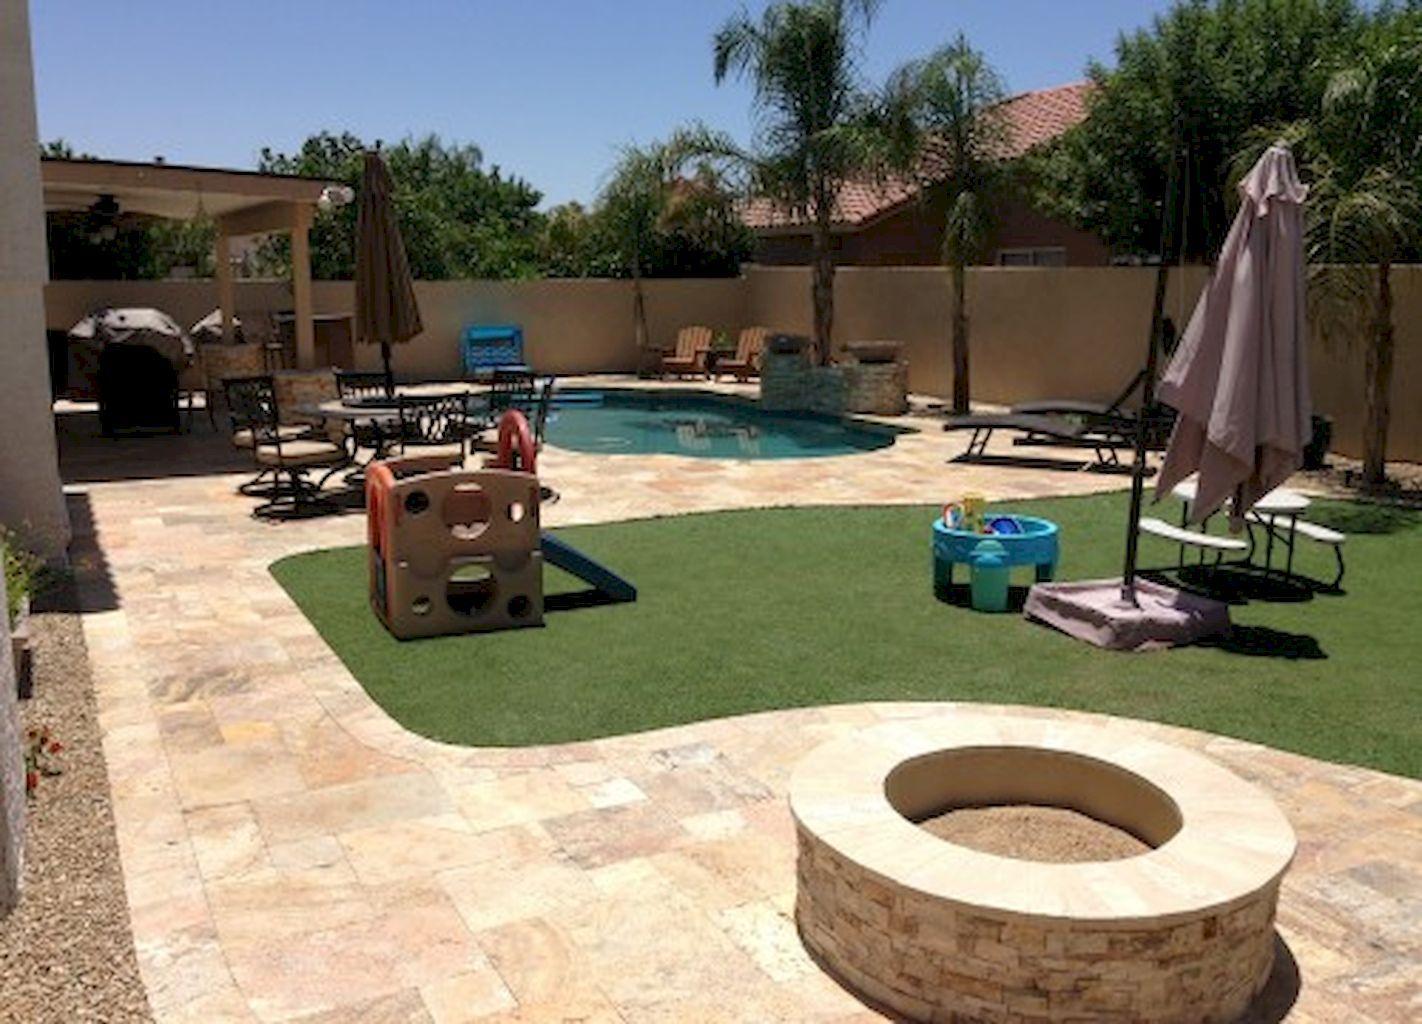 40 Arizona Backyard Ideas On A Budget 26 Arizona Backyard Arizona Backyard Ideas Phoenix Arizona Backyard Landscaping